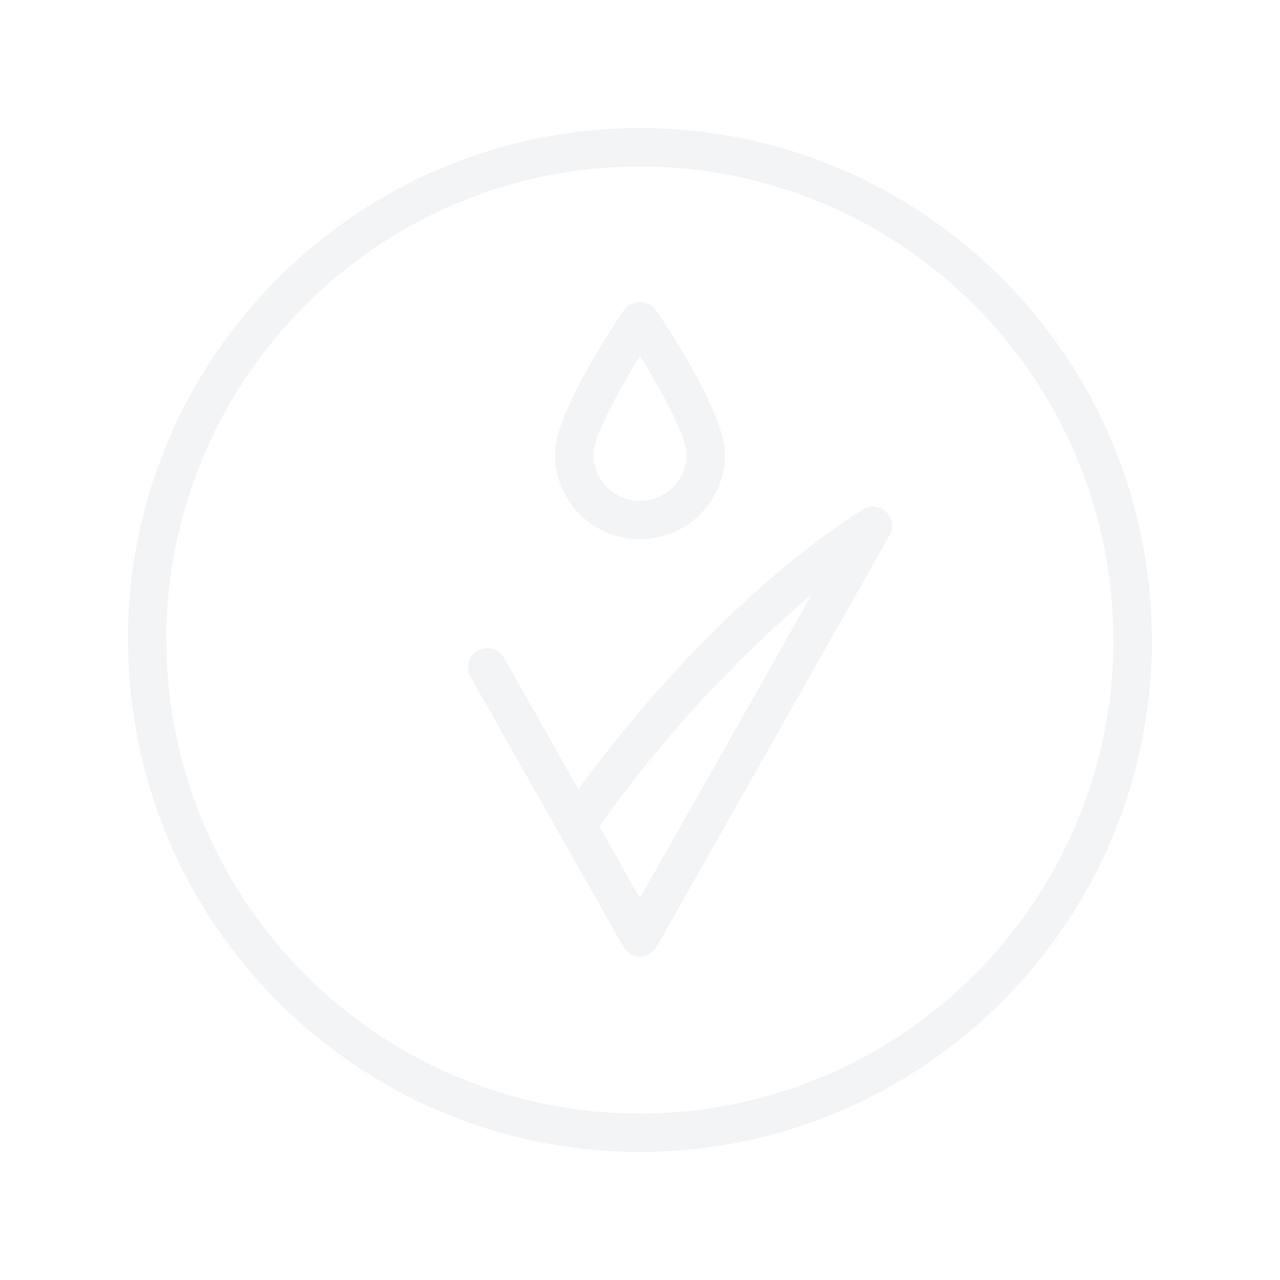 SAMPURE MINERALS Crushed Eyeshadow 1g